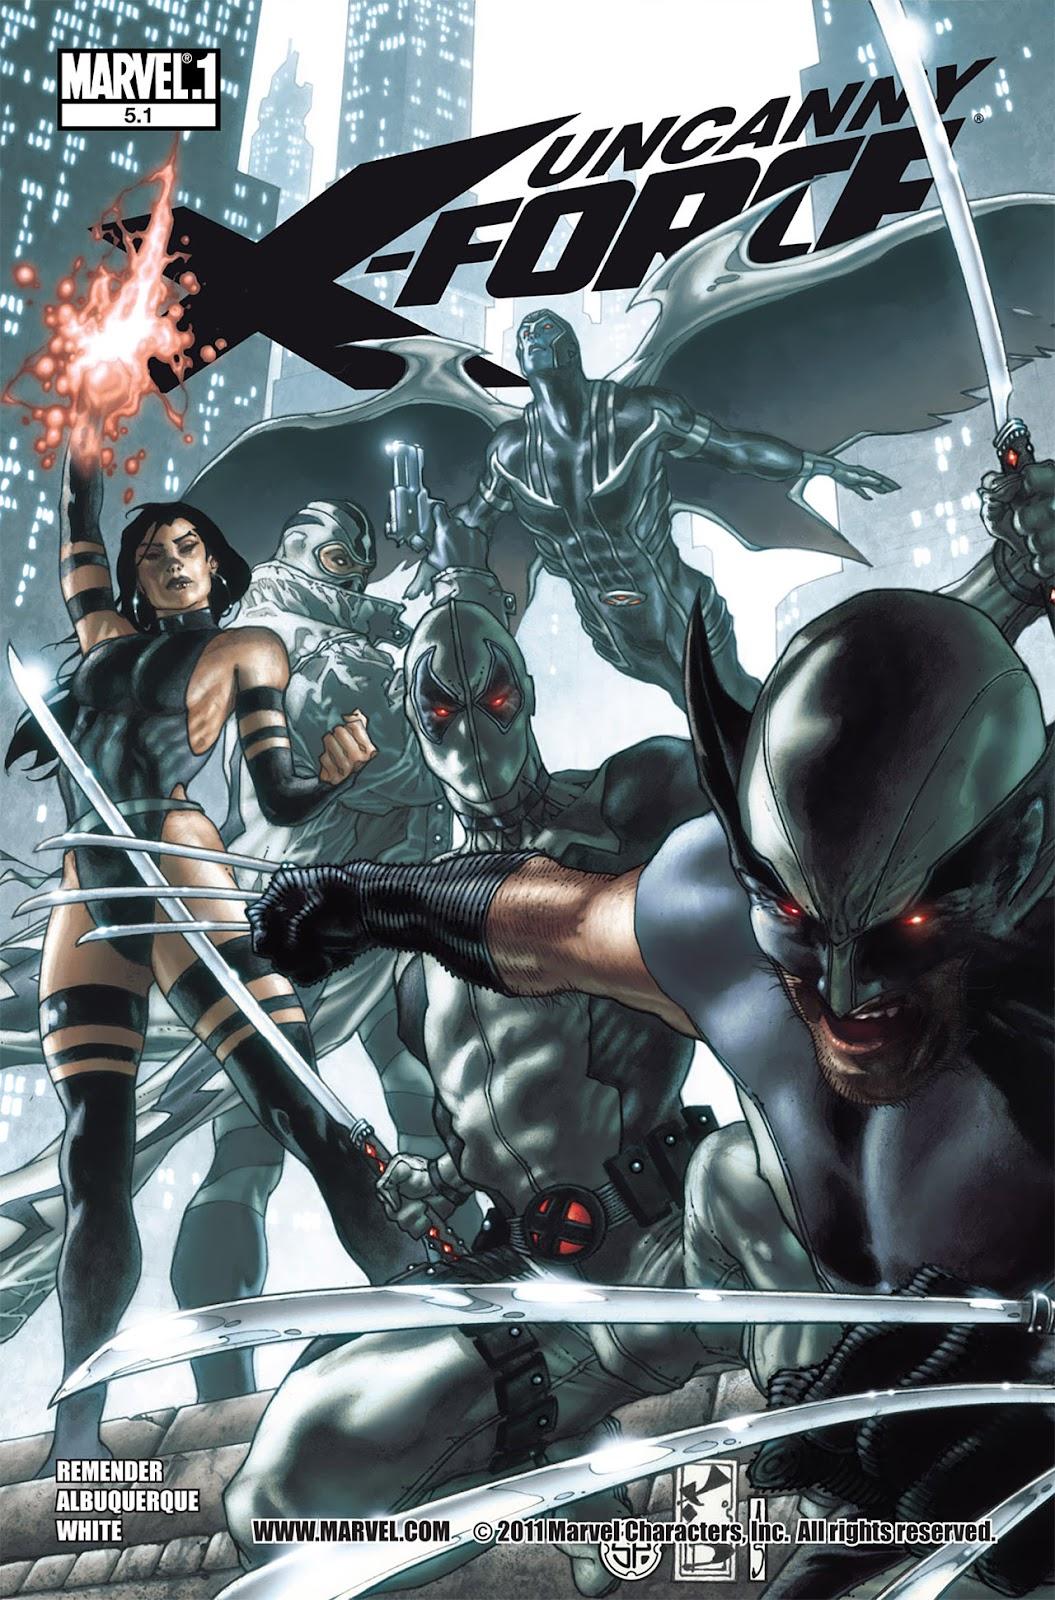 Uncanny X-Force (2010) Issue #5.1 #6 - English 1